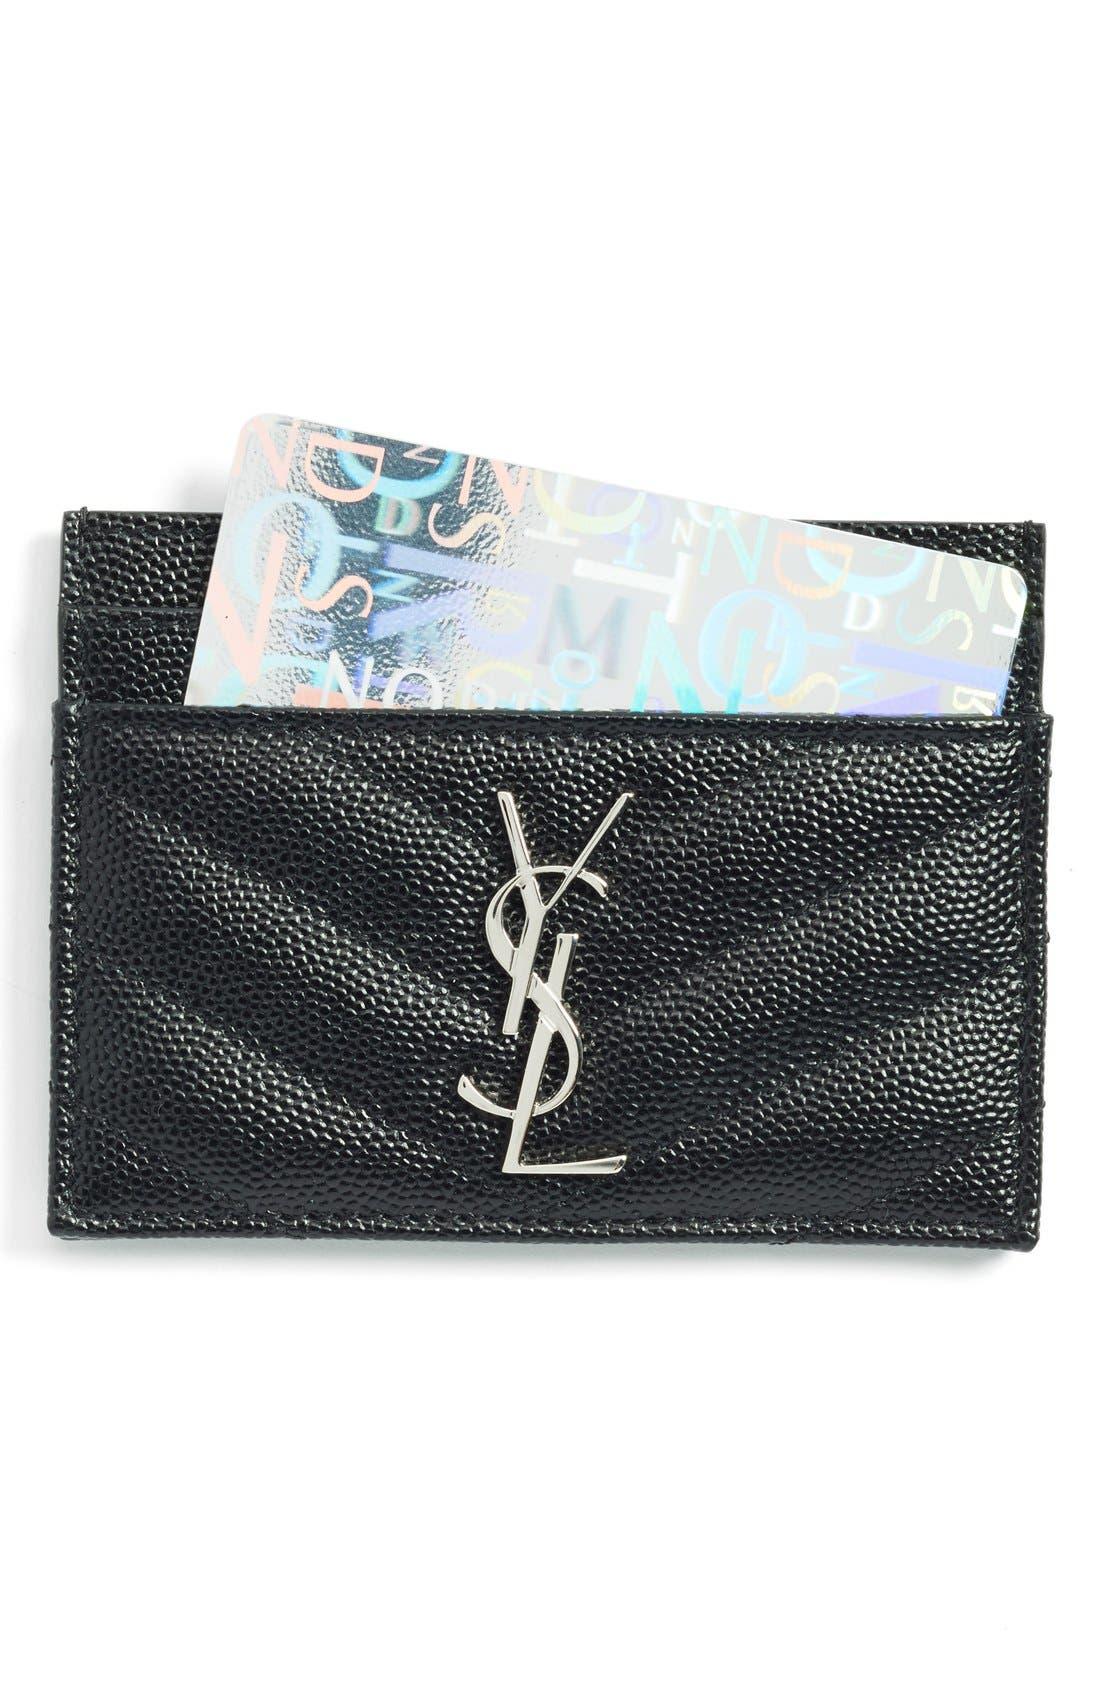 Main Image - Saint Laurent 'Monogram' Credit Card Case